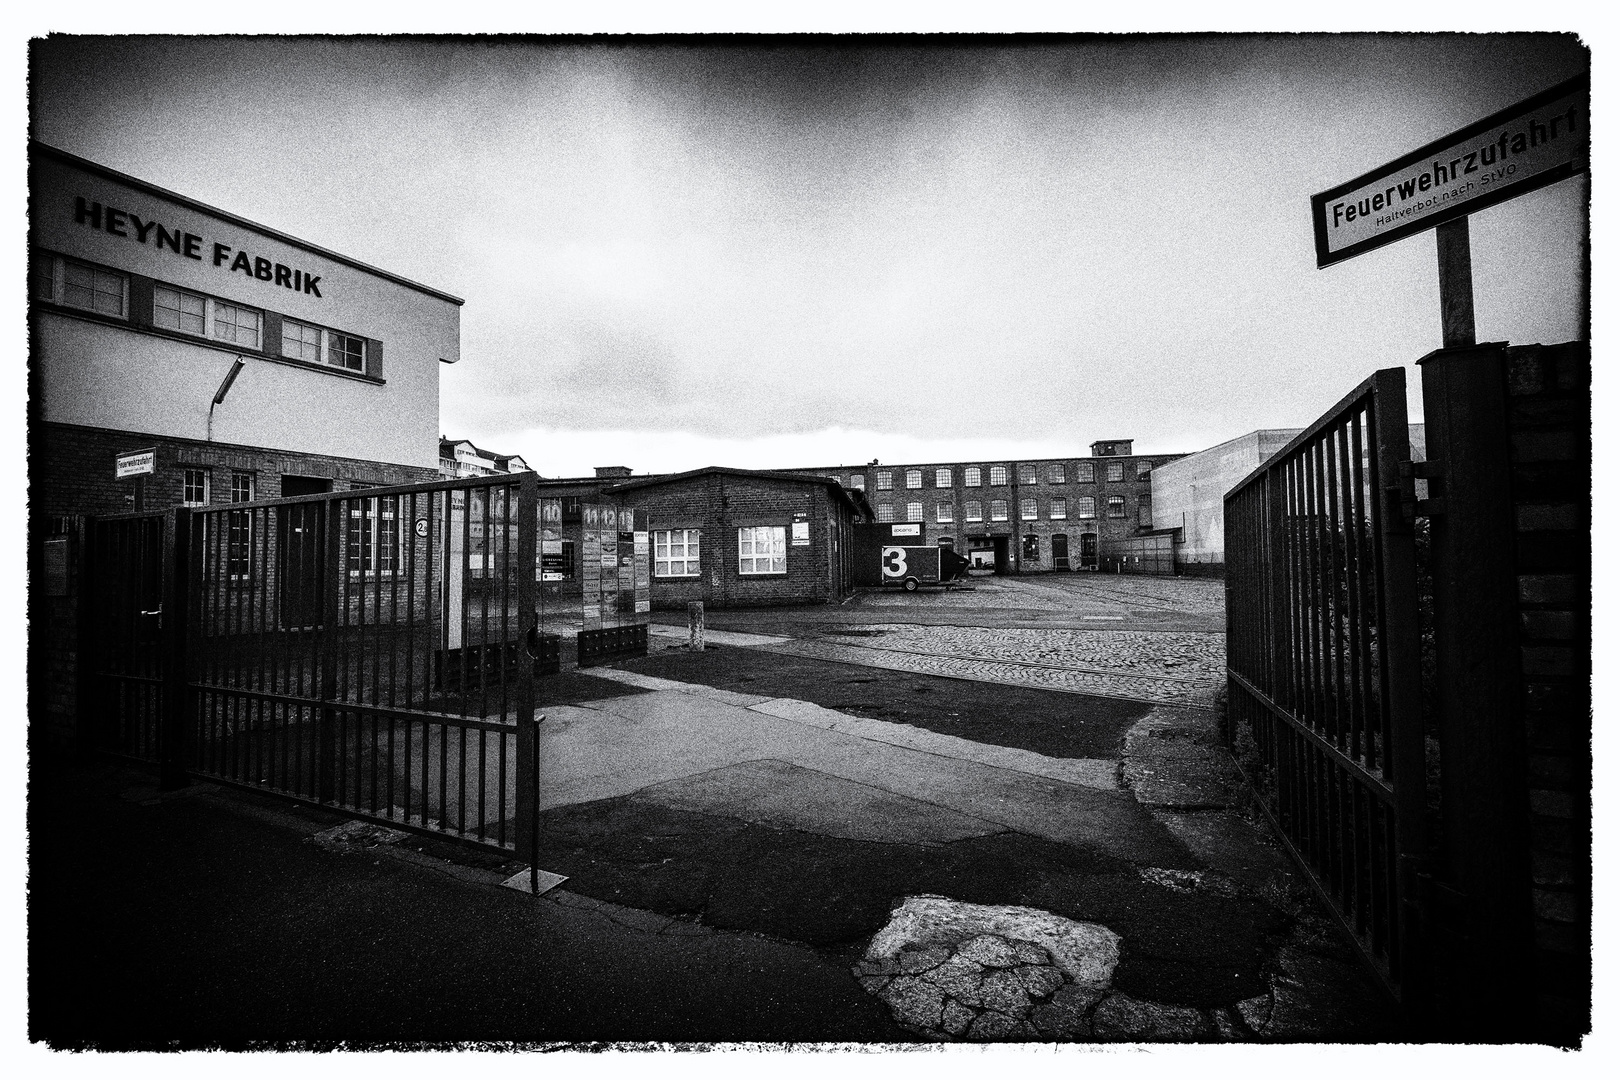 Heyne Fabrik Offenbach Foto & Bild | architektur, stadtlandschaft ...